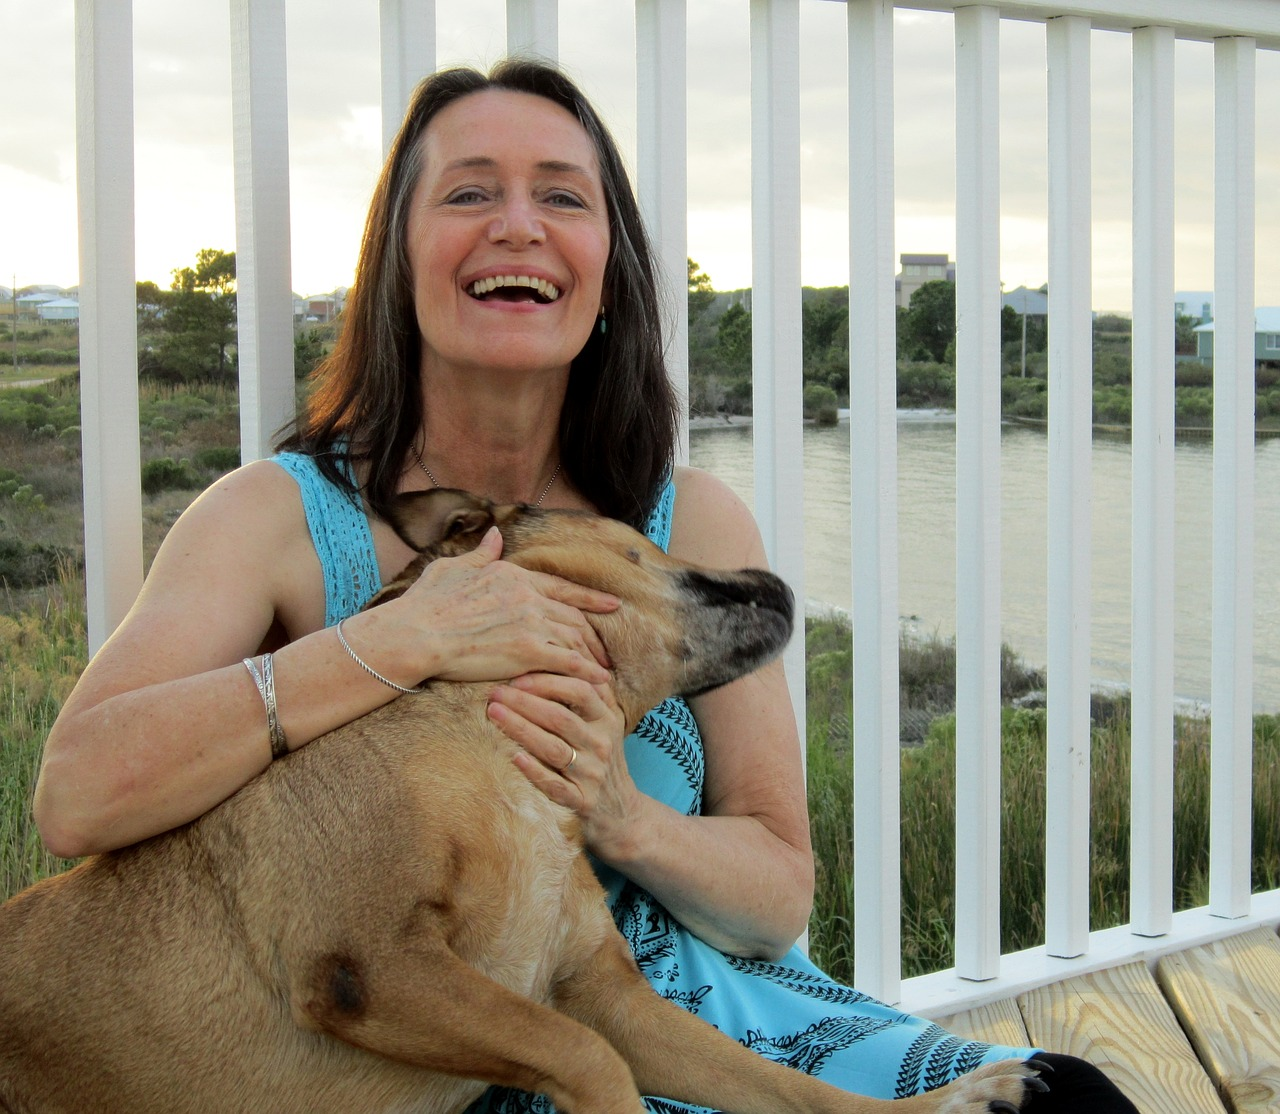 person, woman, dog-2438587.jpg